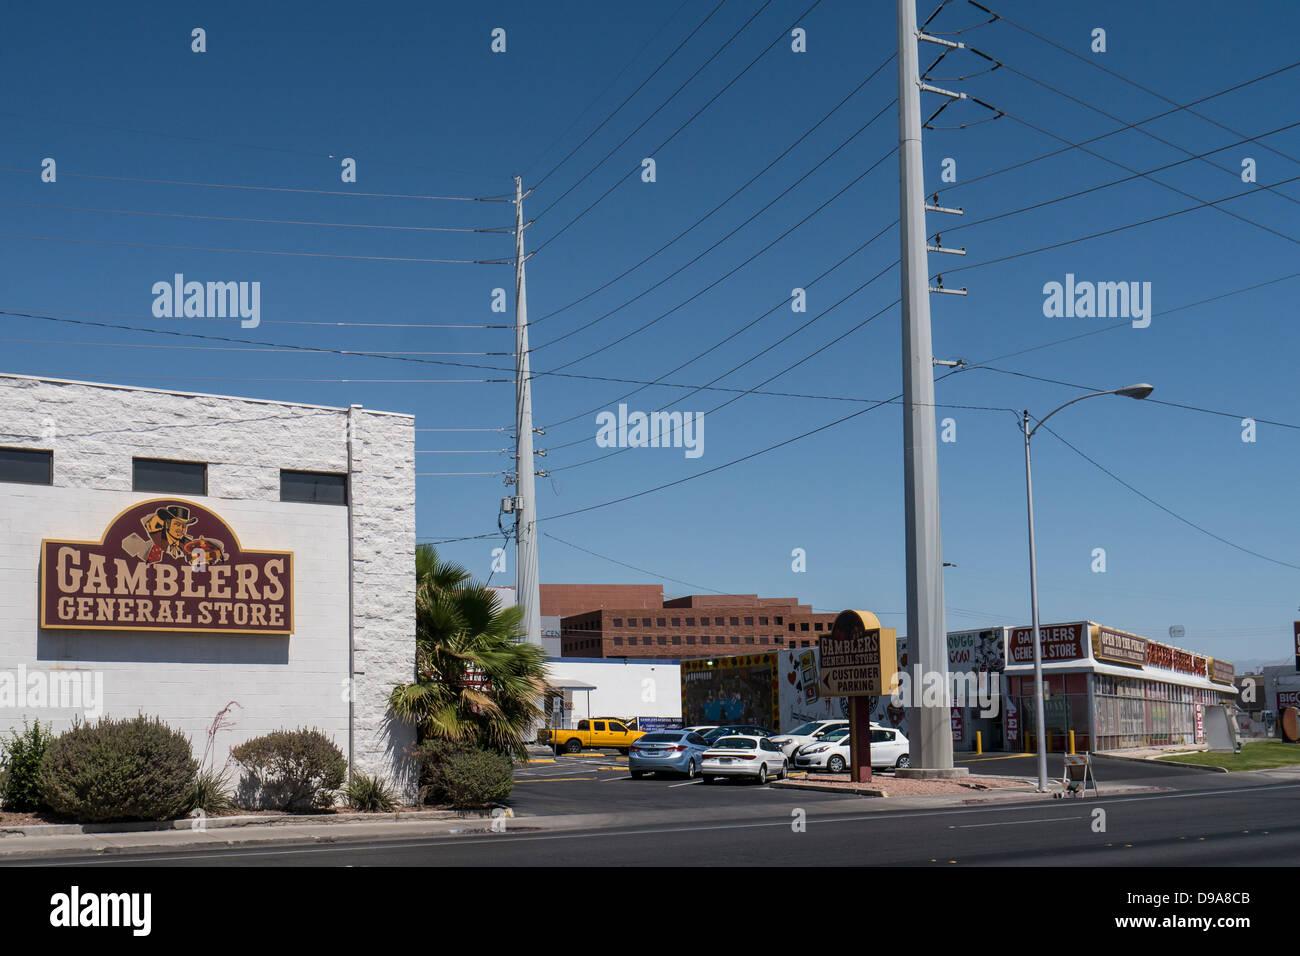 Gamblers General Store in Downtown Las Vegas, Nevada - Stock Image